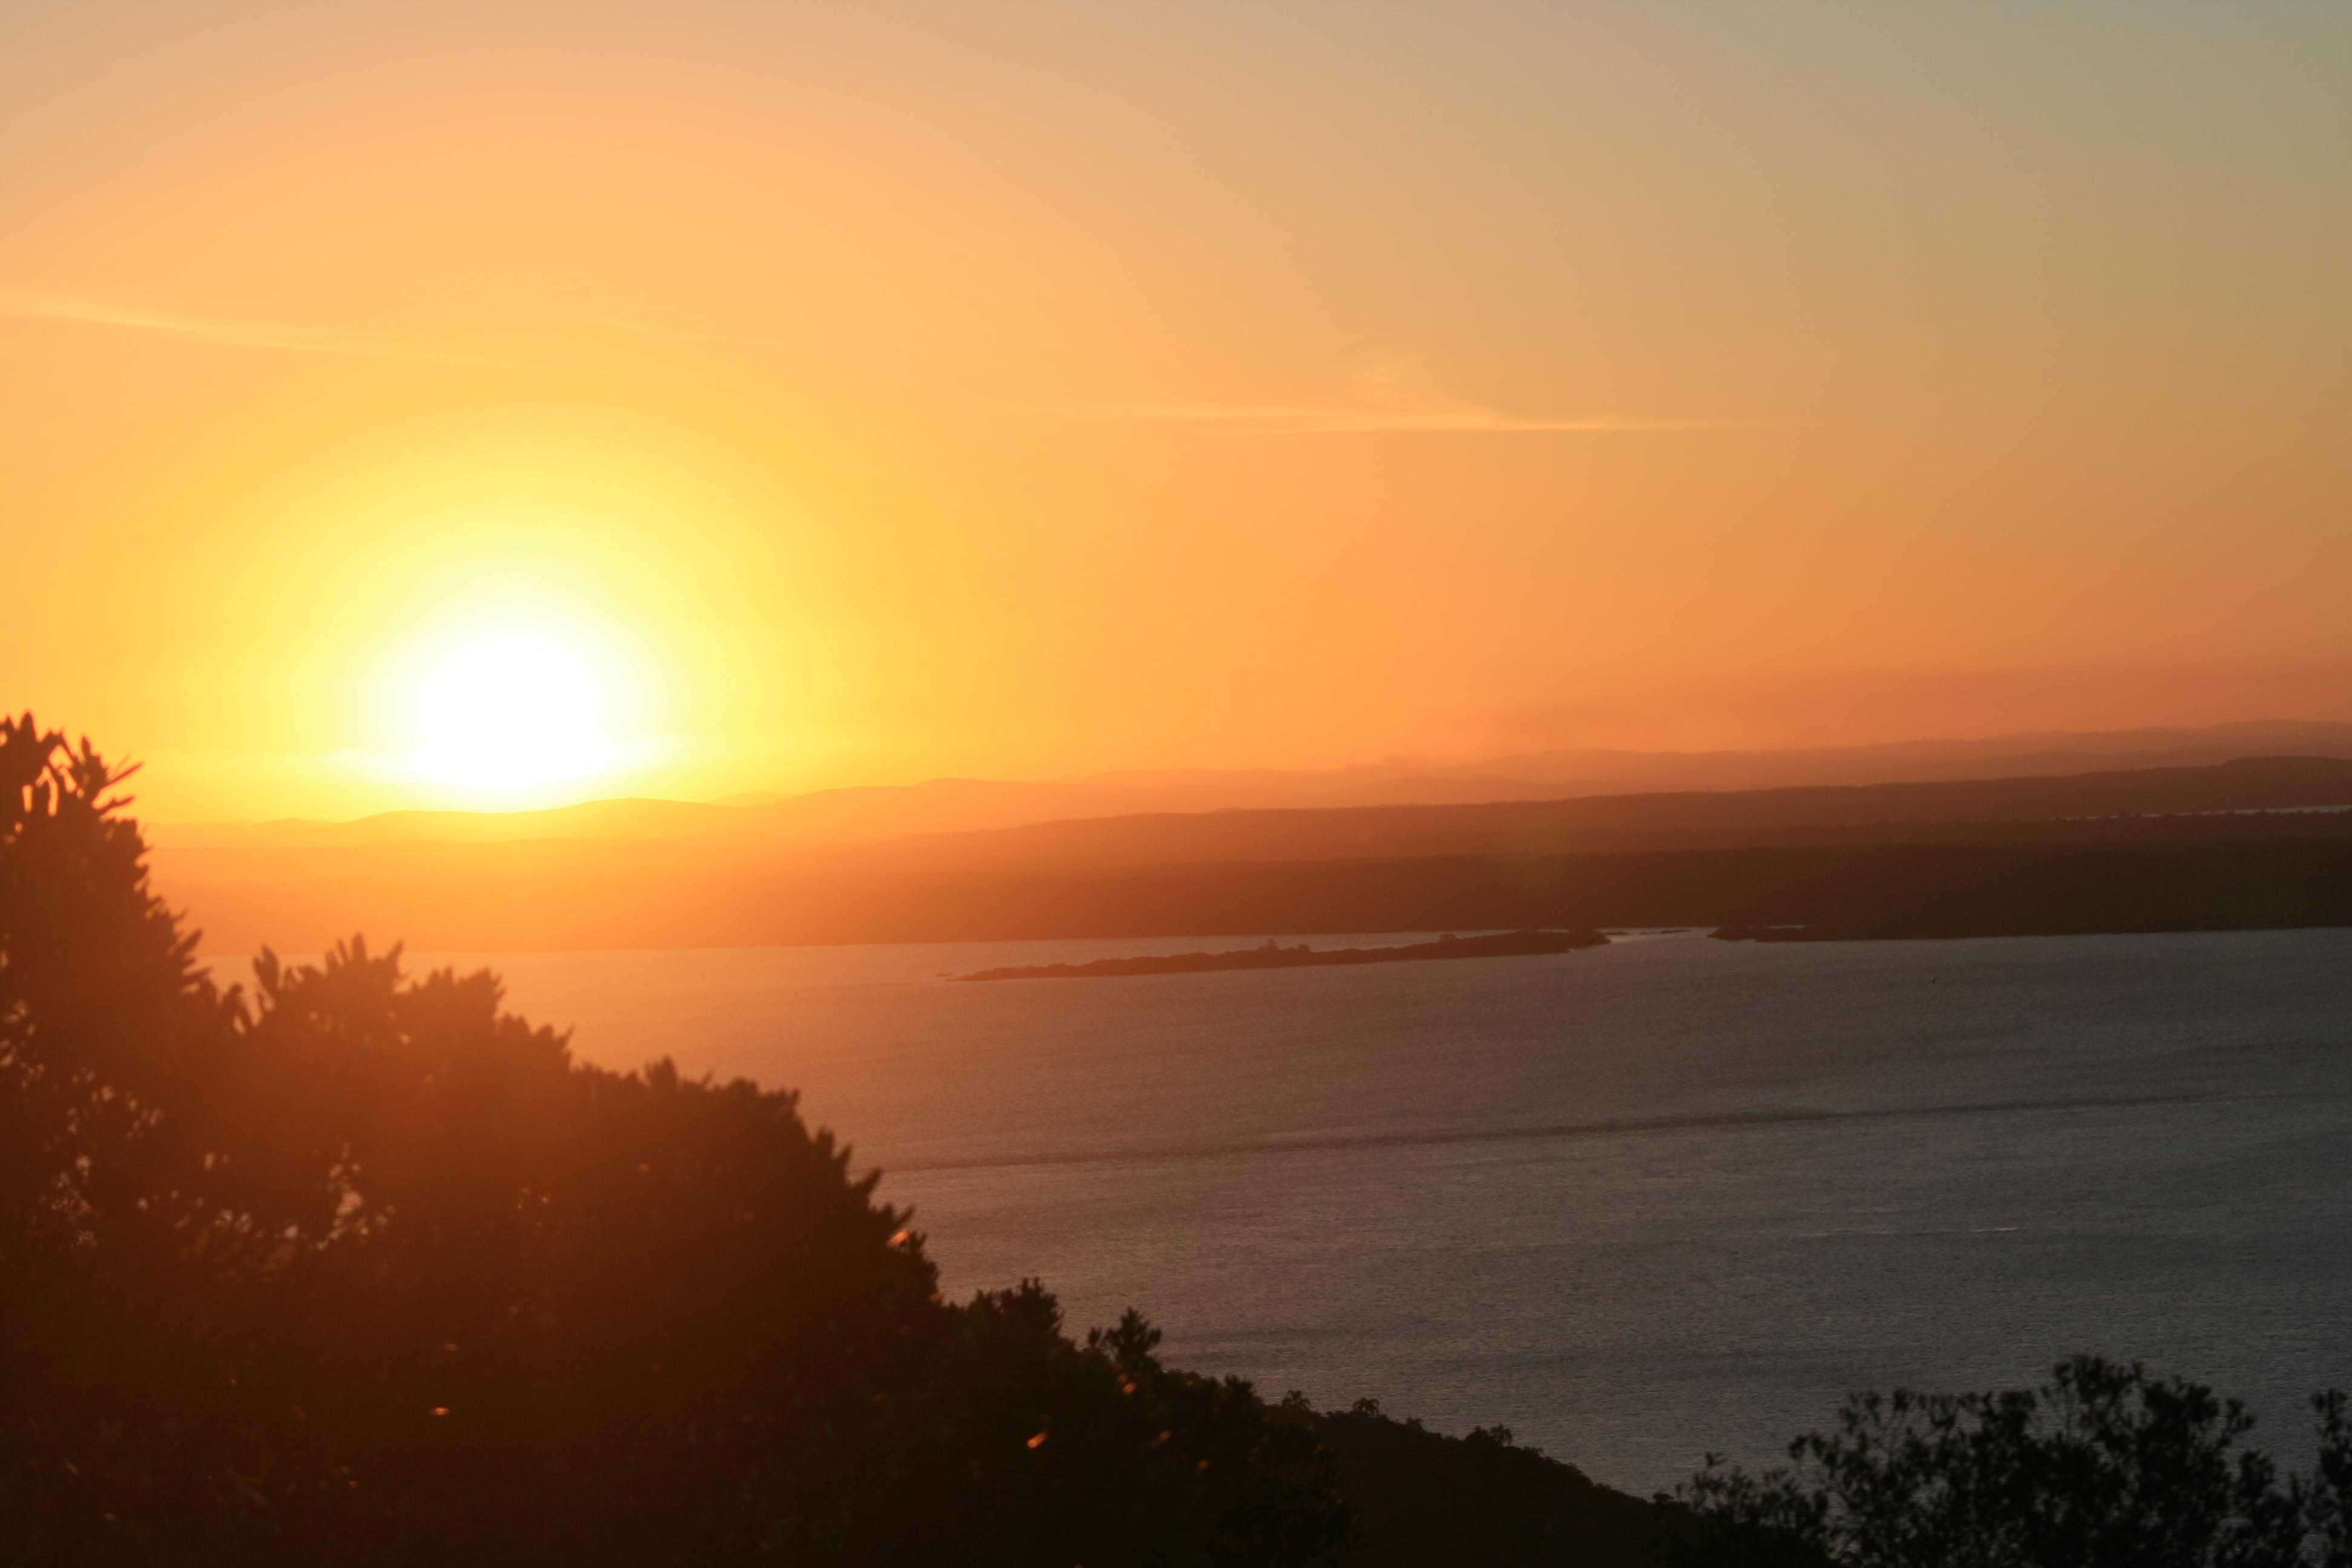 Crepúsculo na Trilha da Pedra da Visão, Parque Estadual de Itapuã. Foto: Aquiles Bastiani Naressi